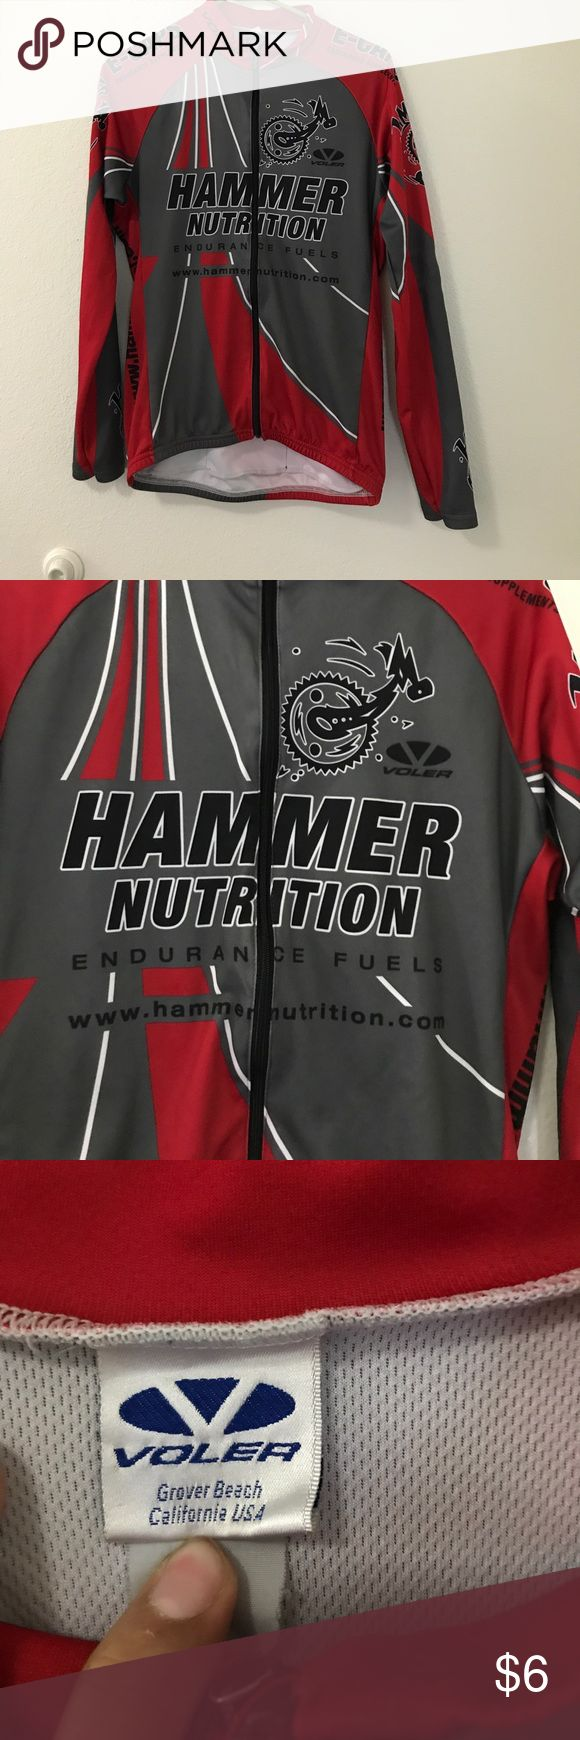 Motocross racing shirt size M Men's motocross shirt size medium voler Jackets & Coats